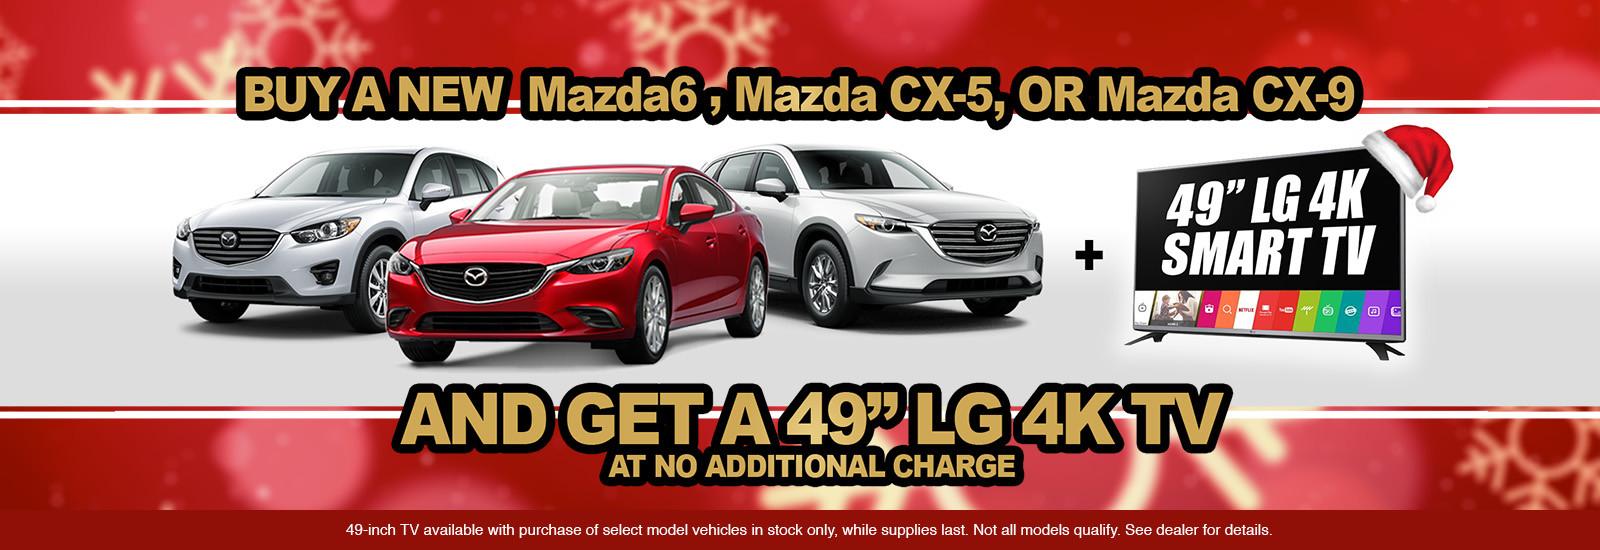 Holiday_Mazda_1600x550